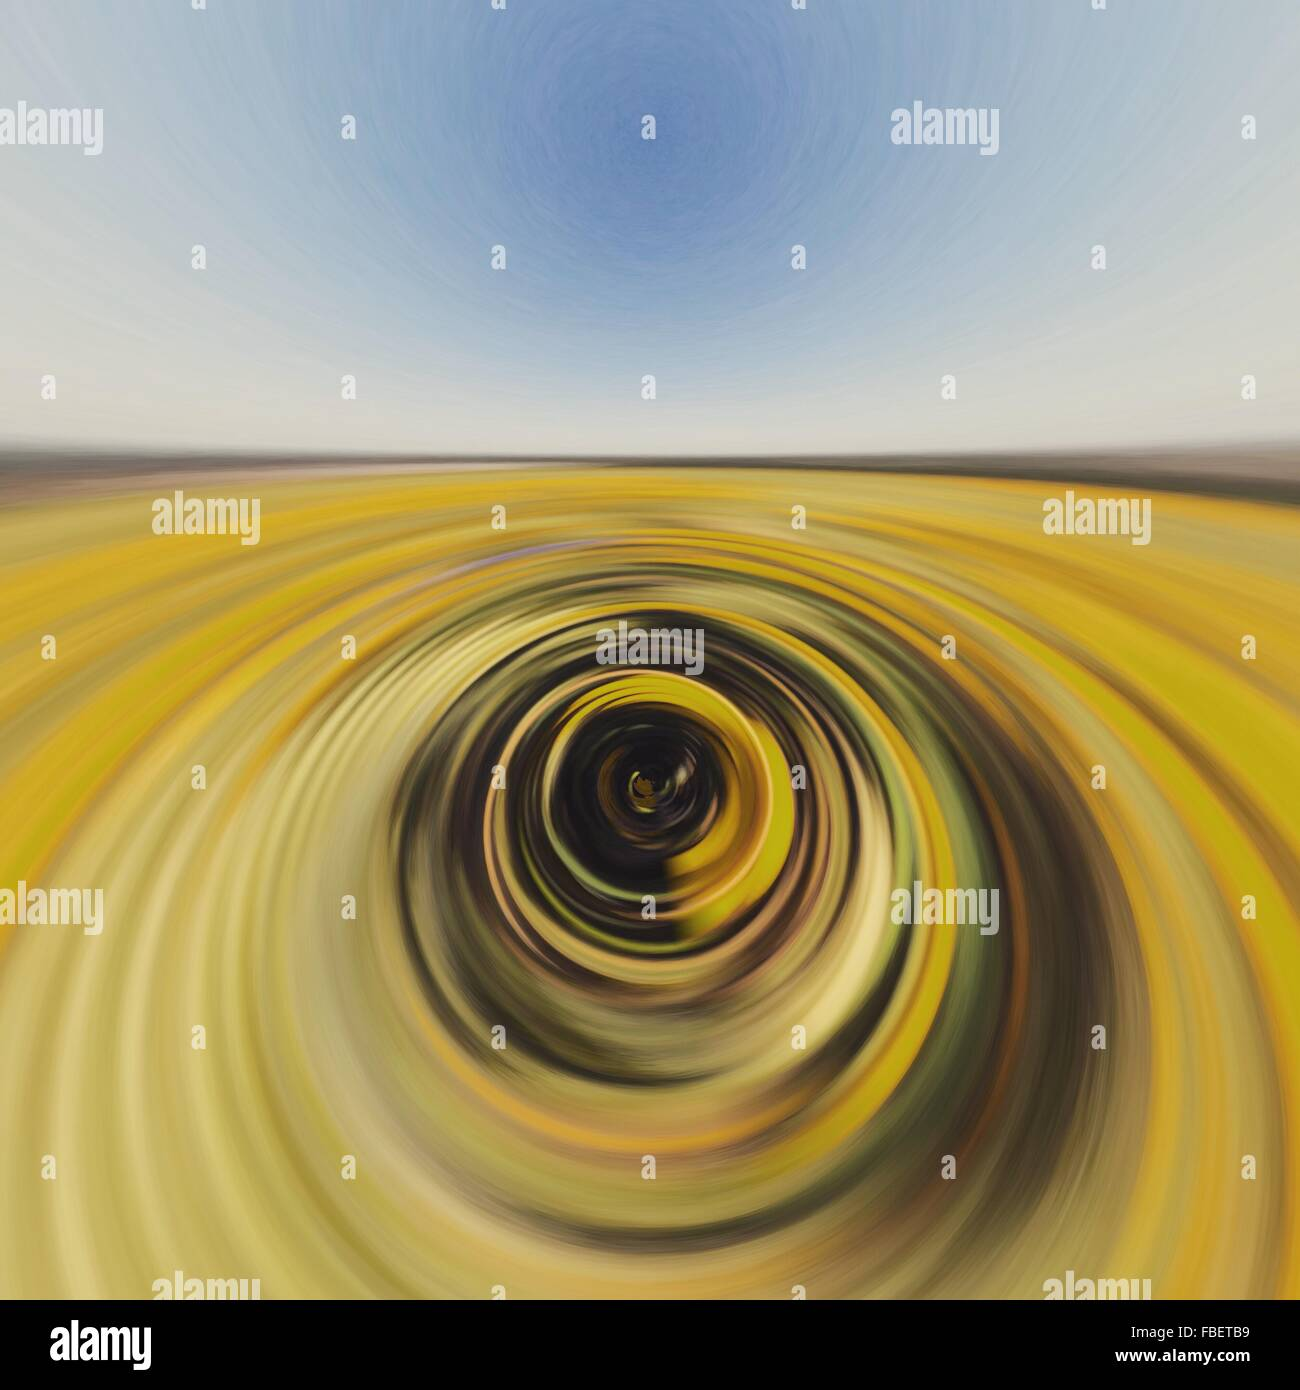 Digital Composite Image Of Spiral Field Against Sky - Stock Image